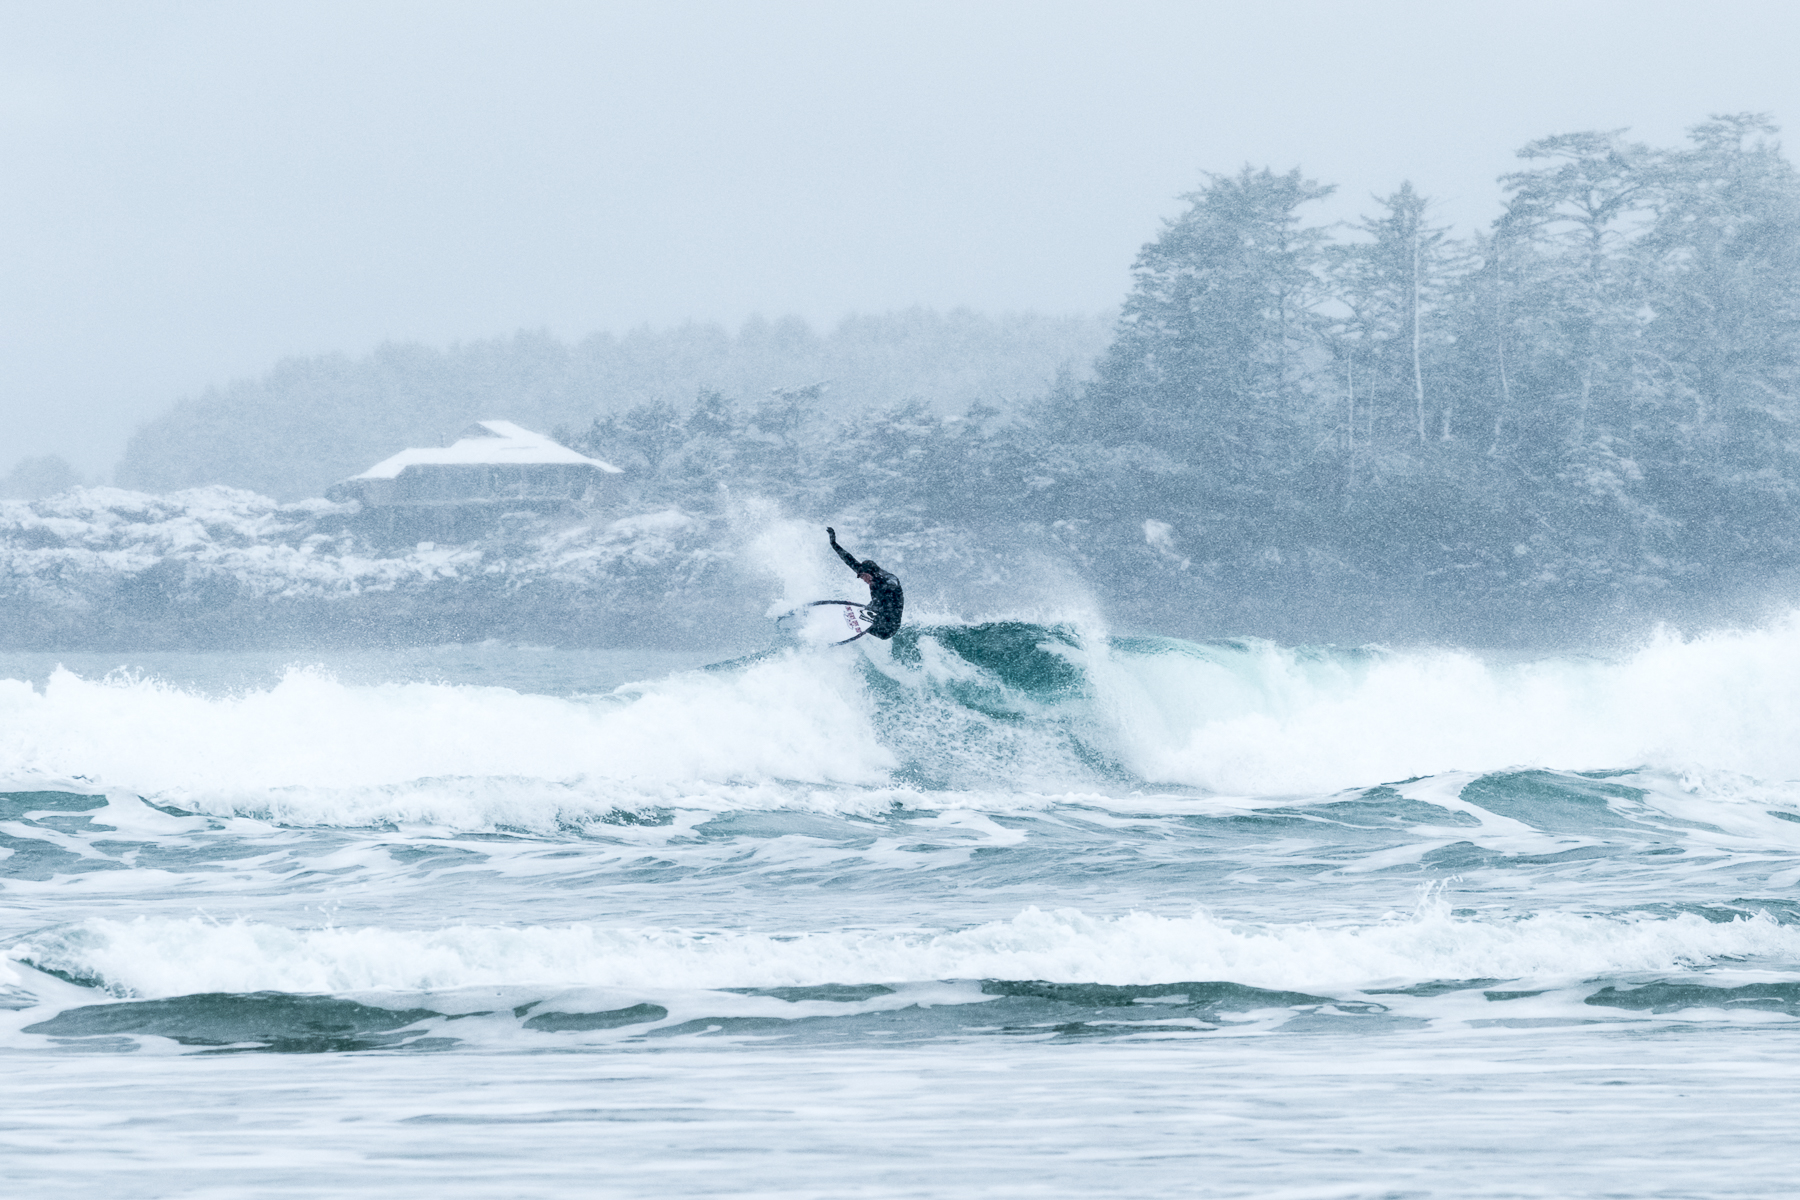 Tofino Surf Photography